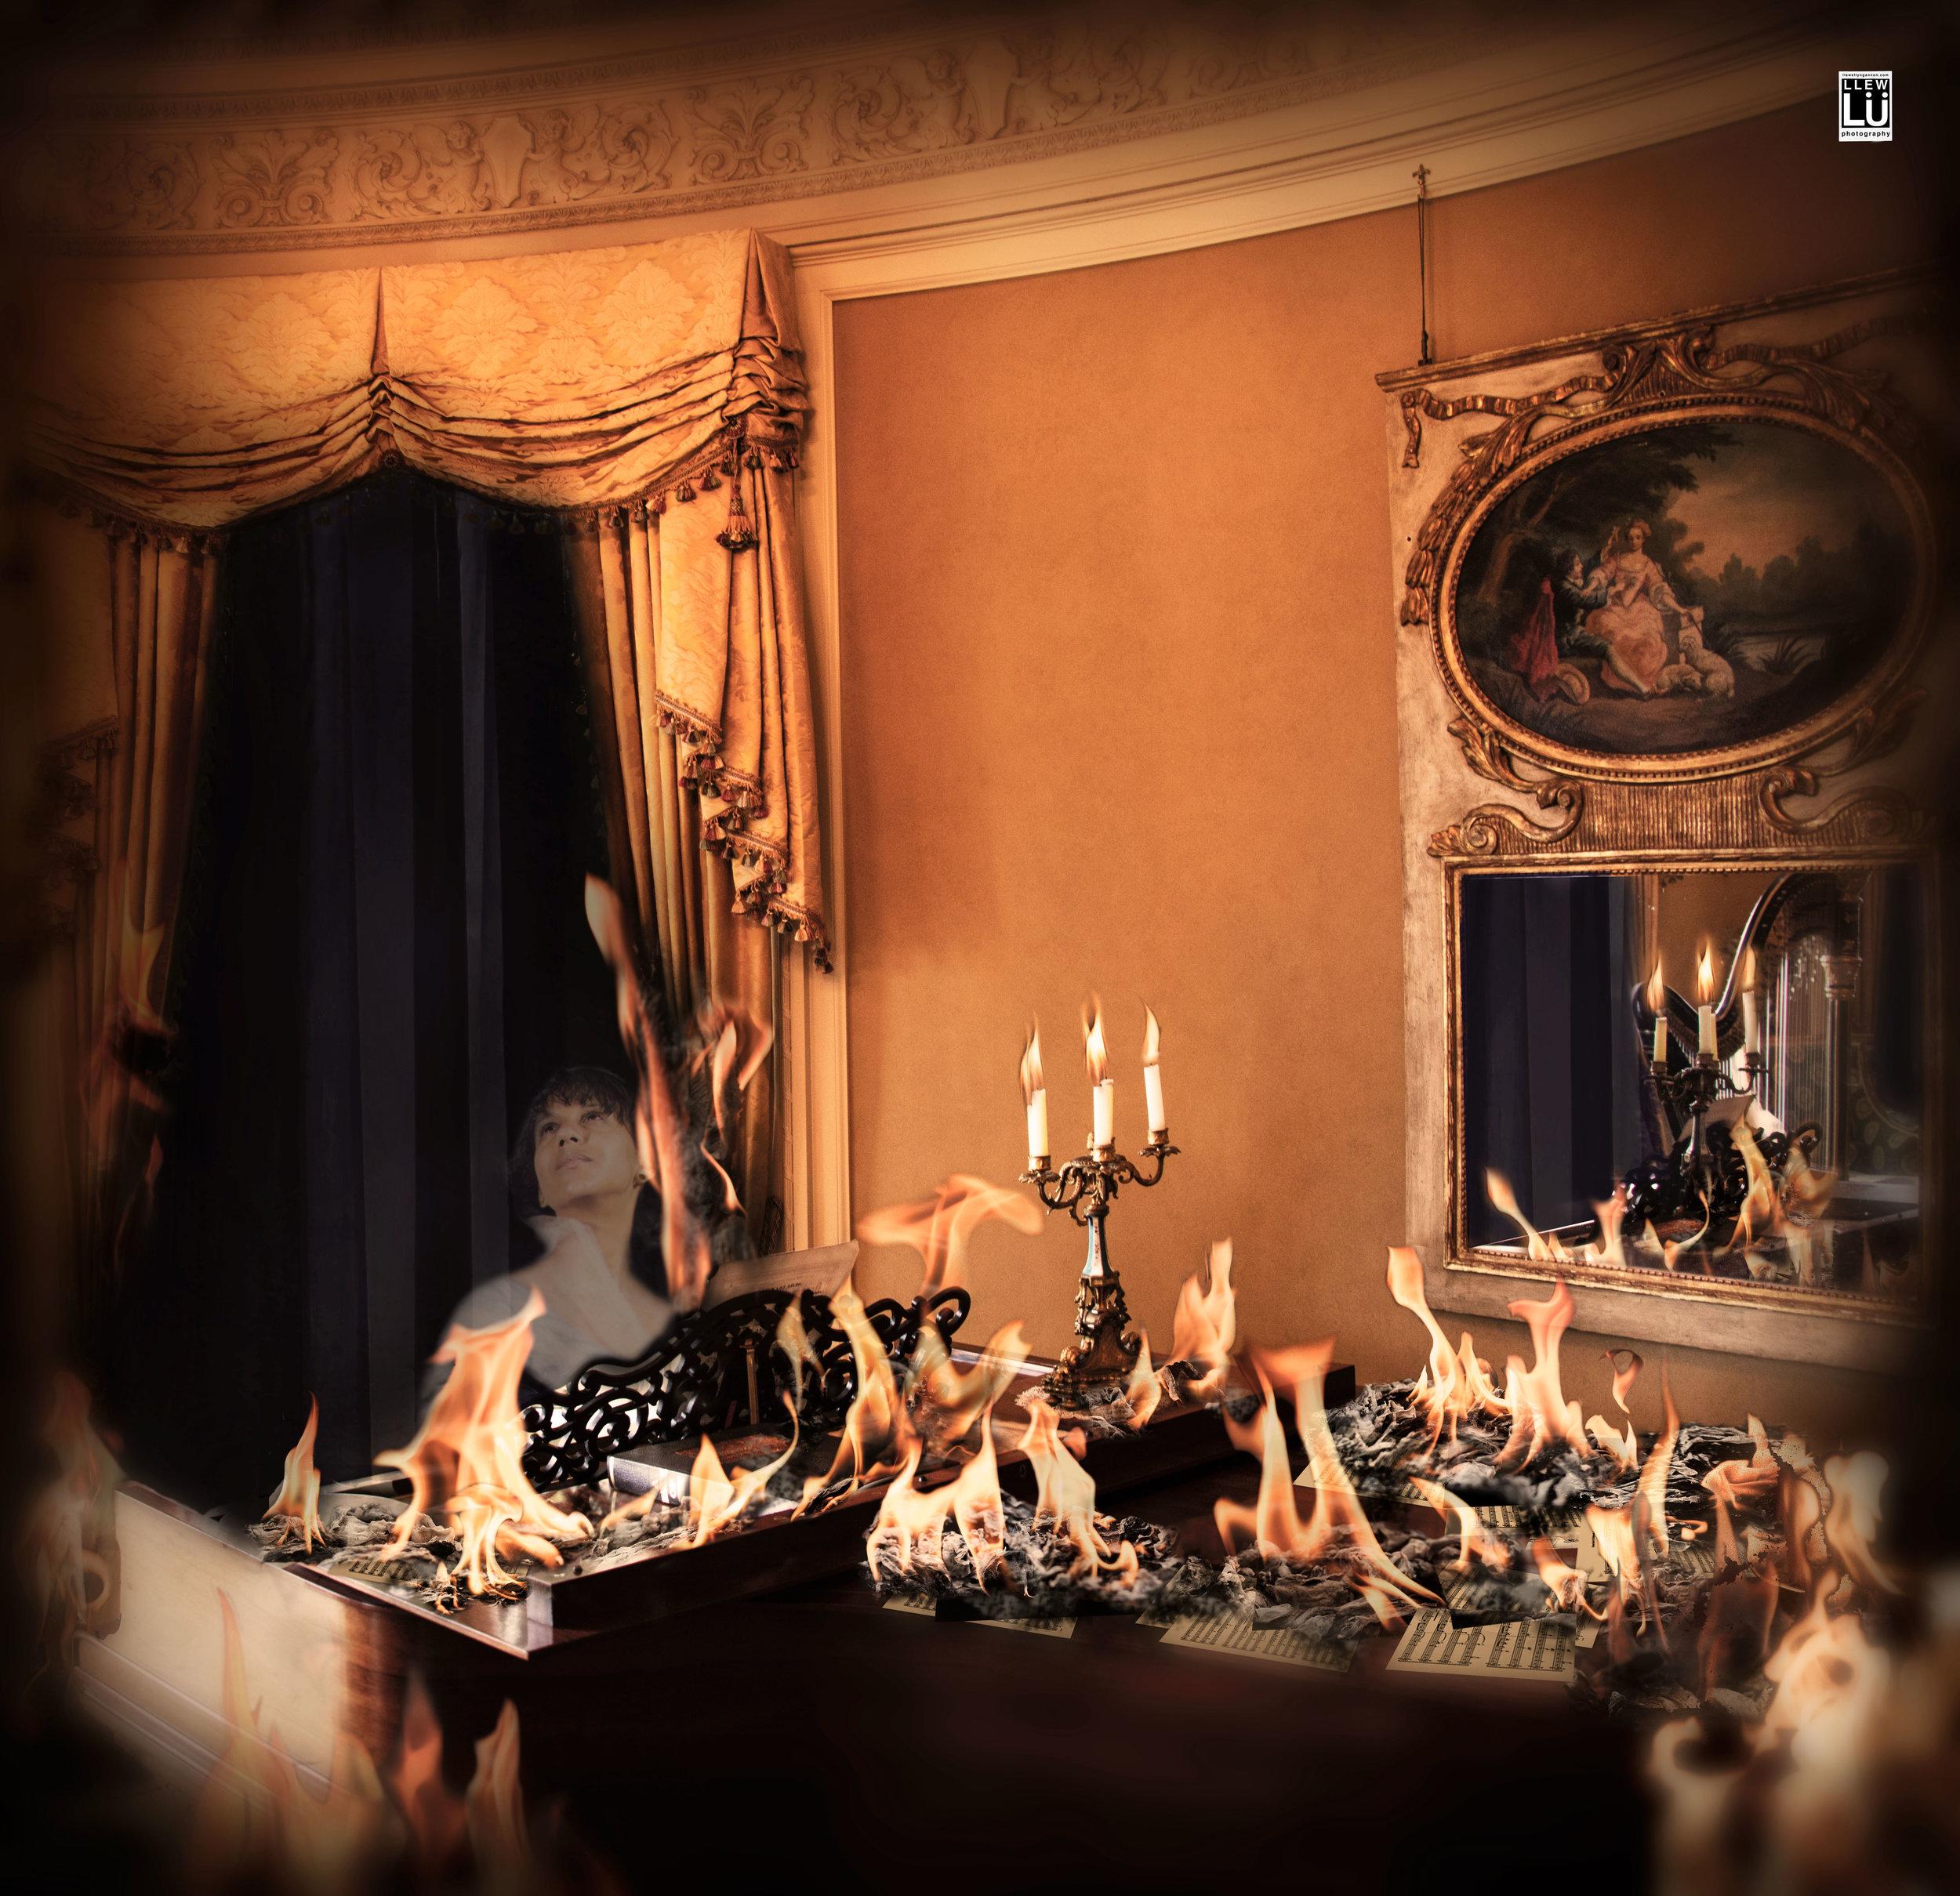 pianofire.jpg